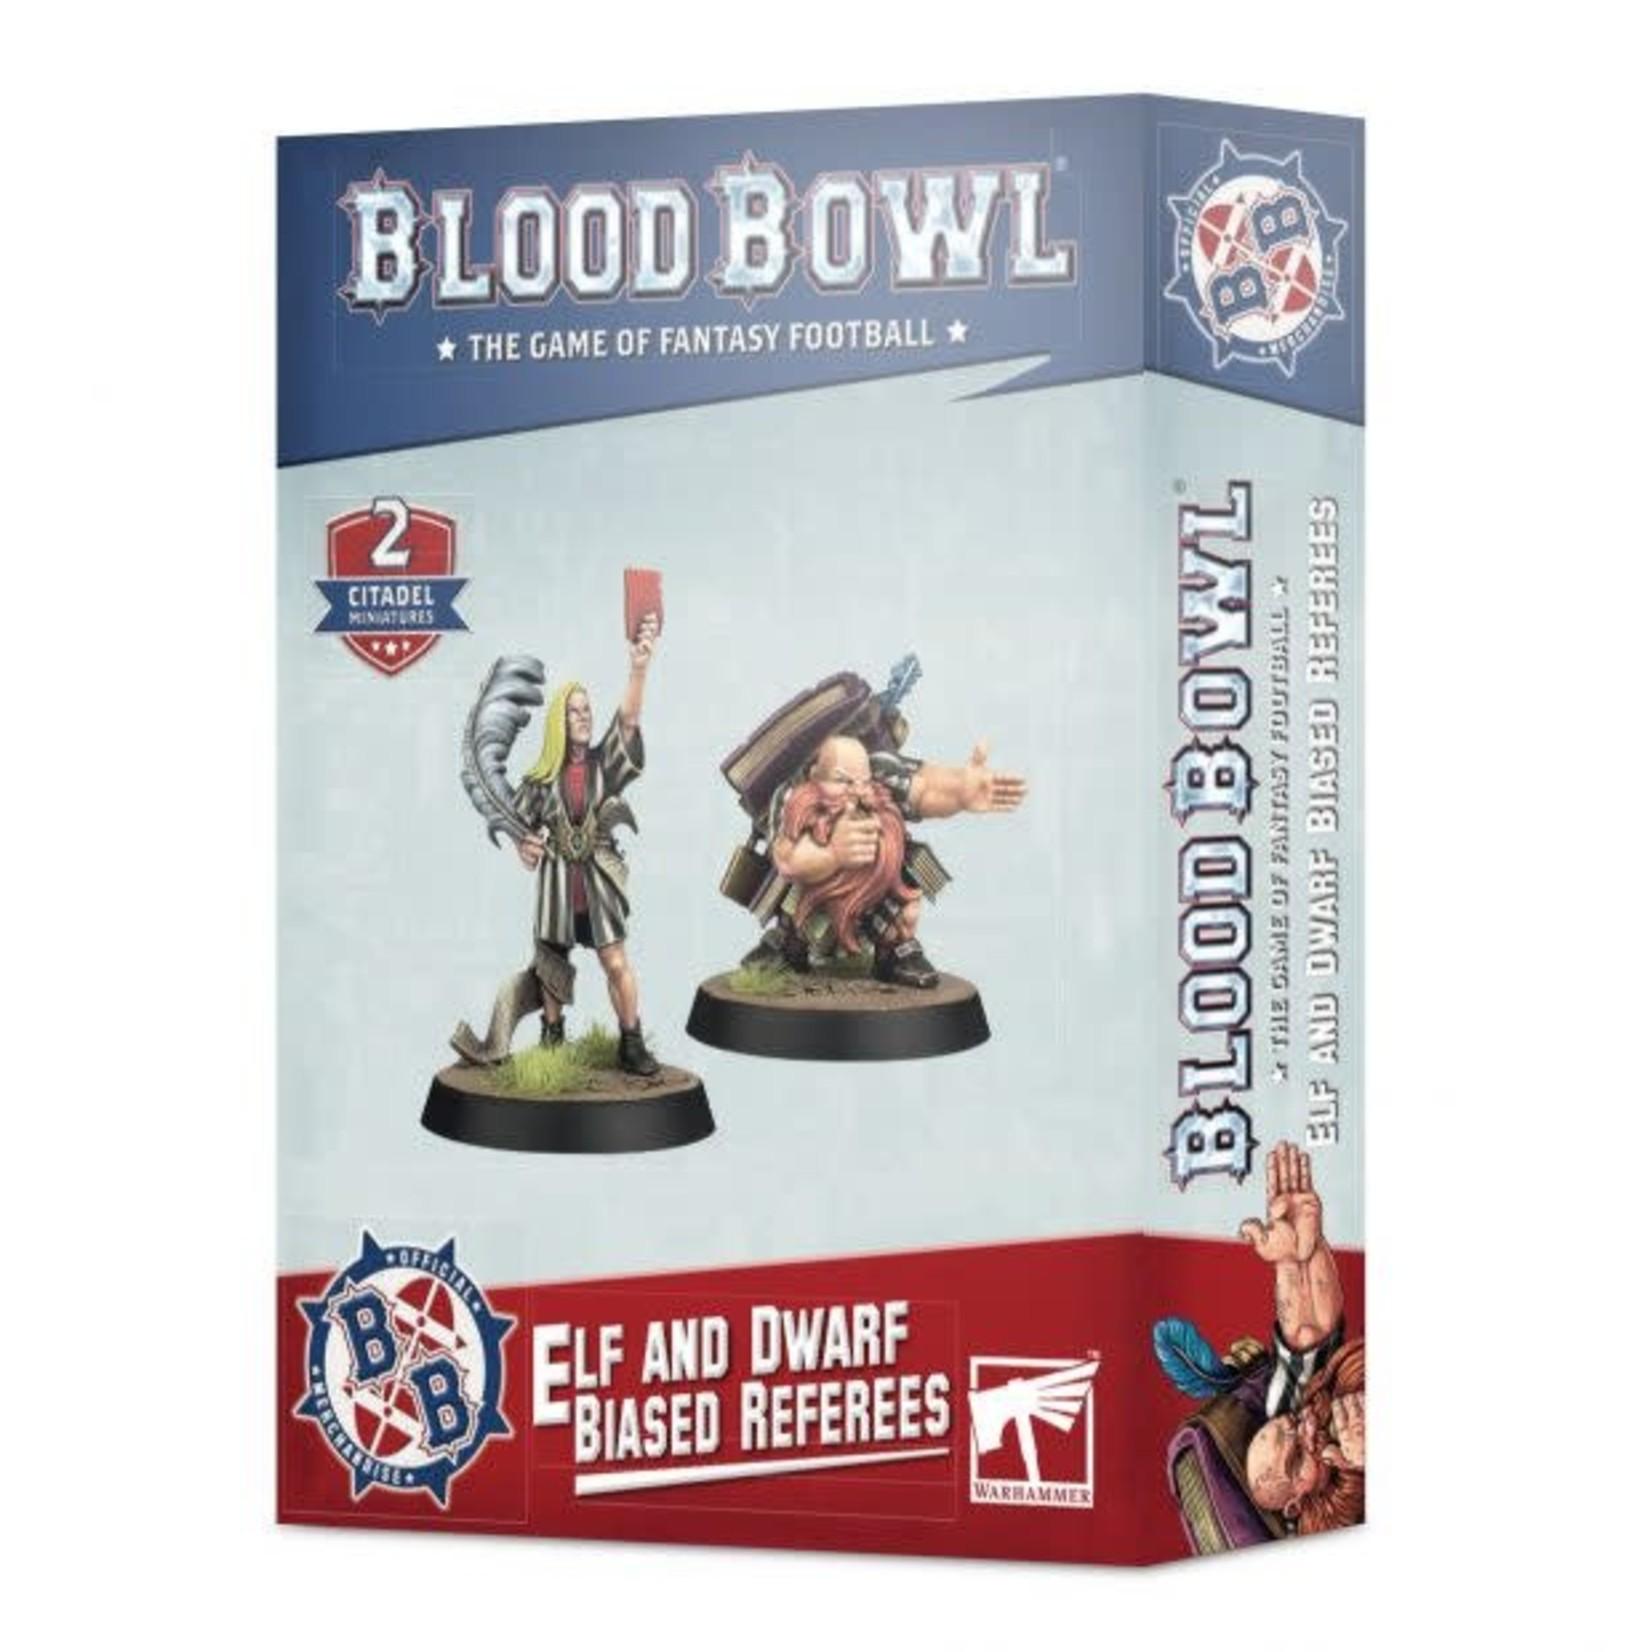 Blood Bowl BloodBowl -  Elf and Dwarf Biased Referees